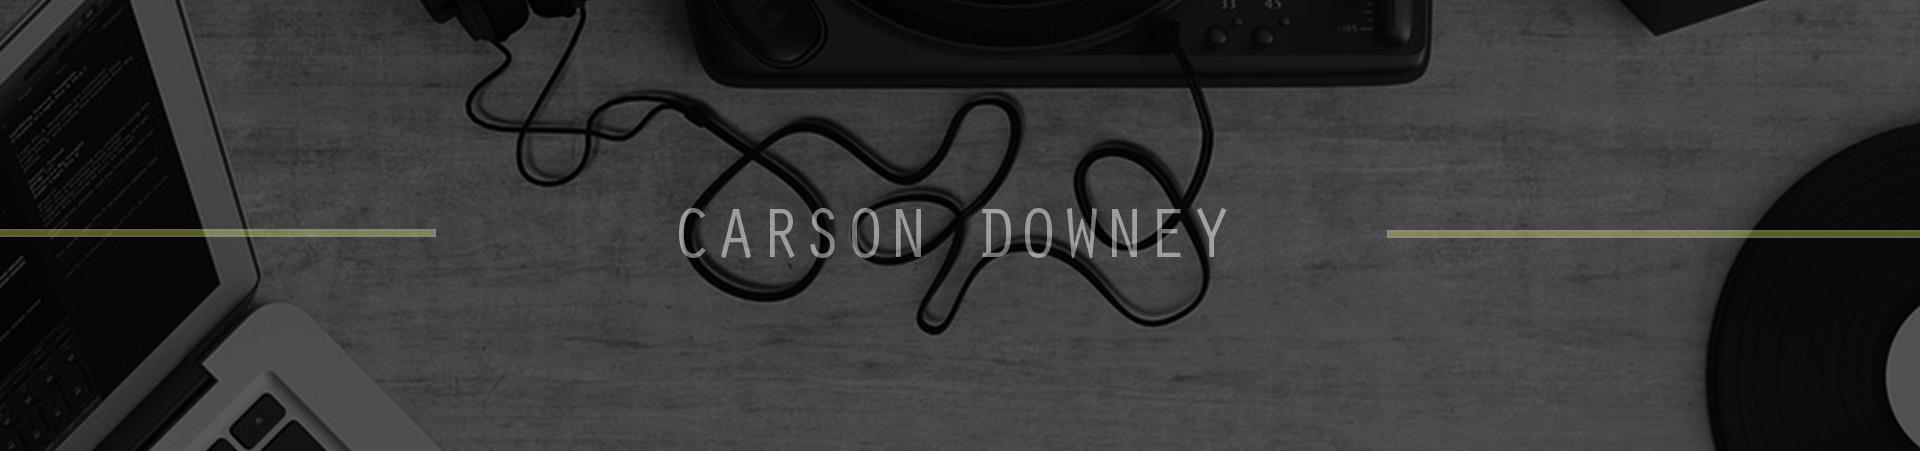 CARSON DOWNEY